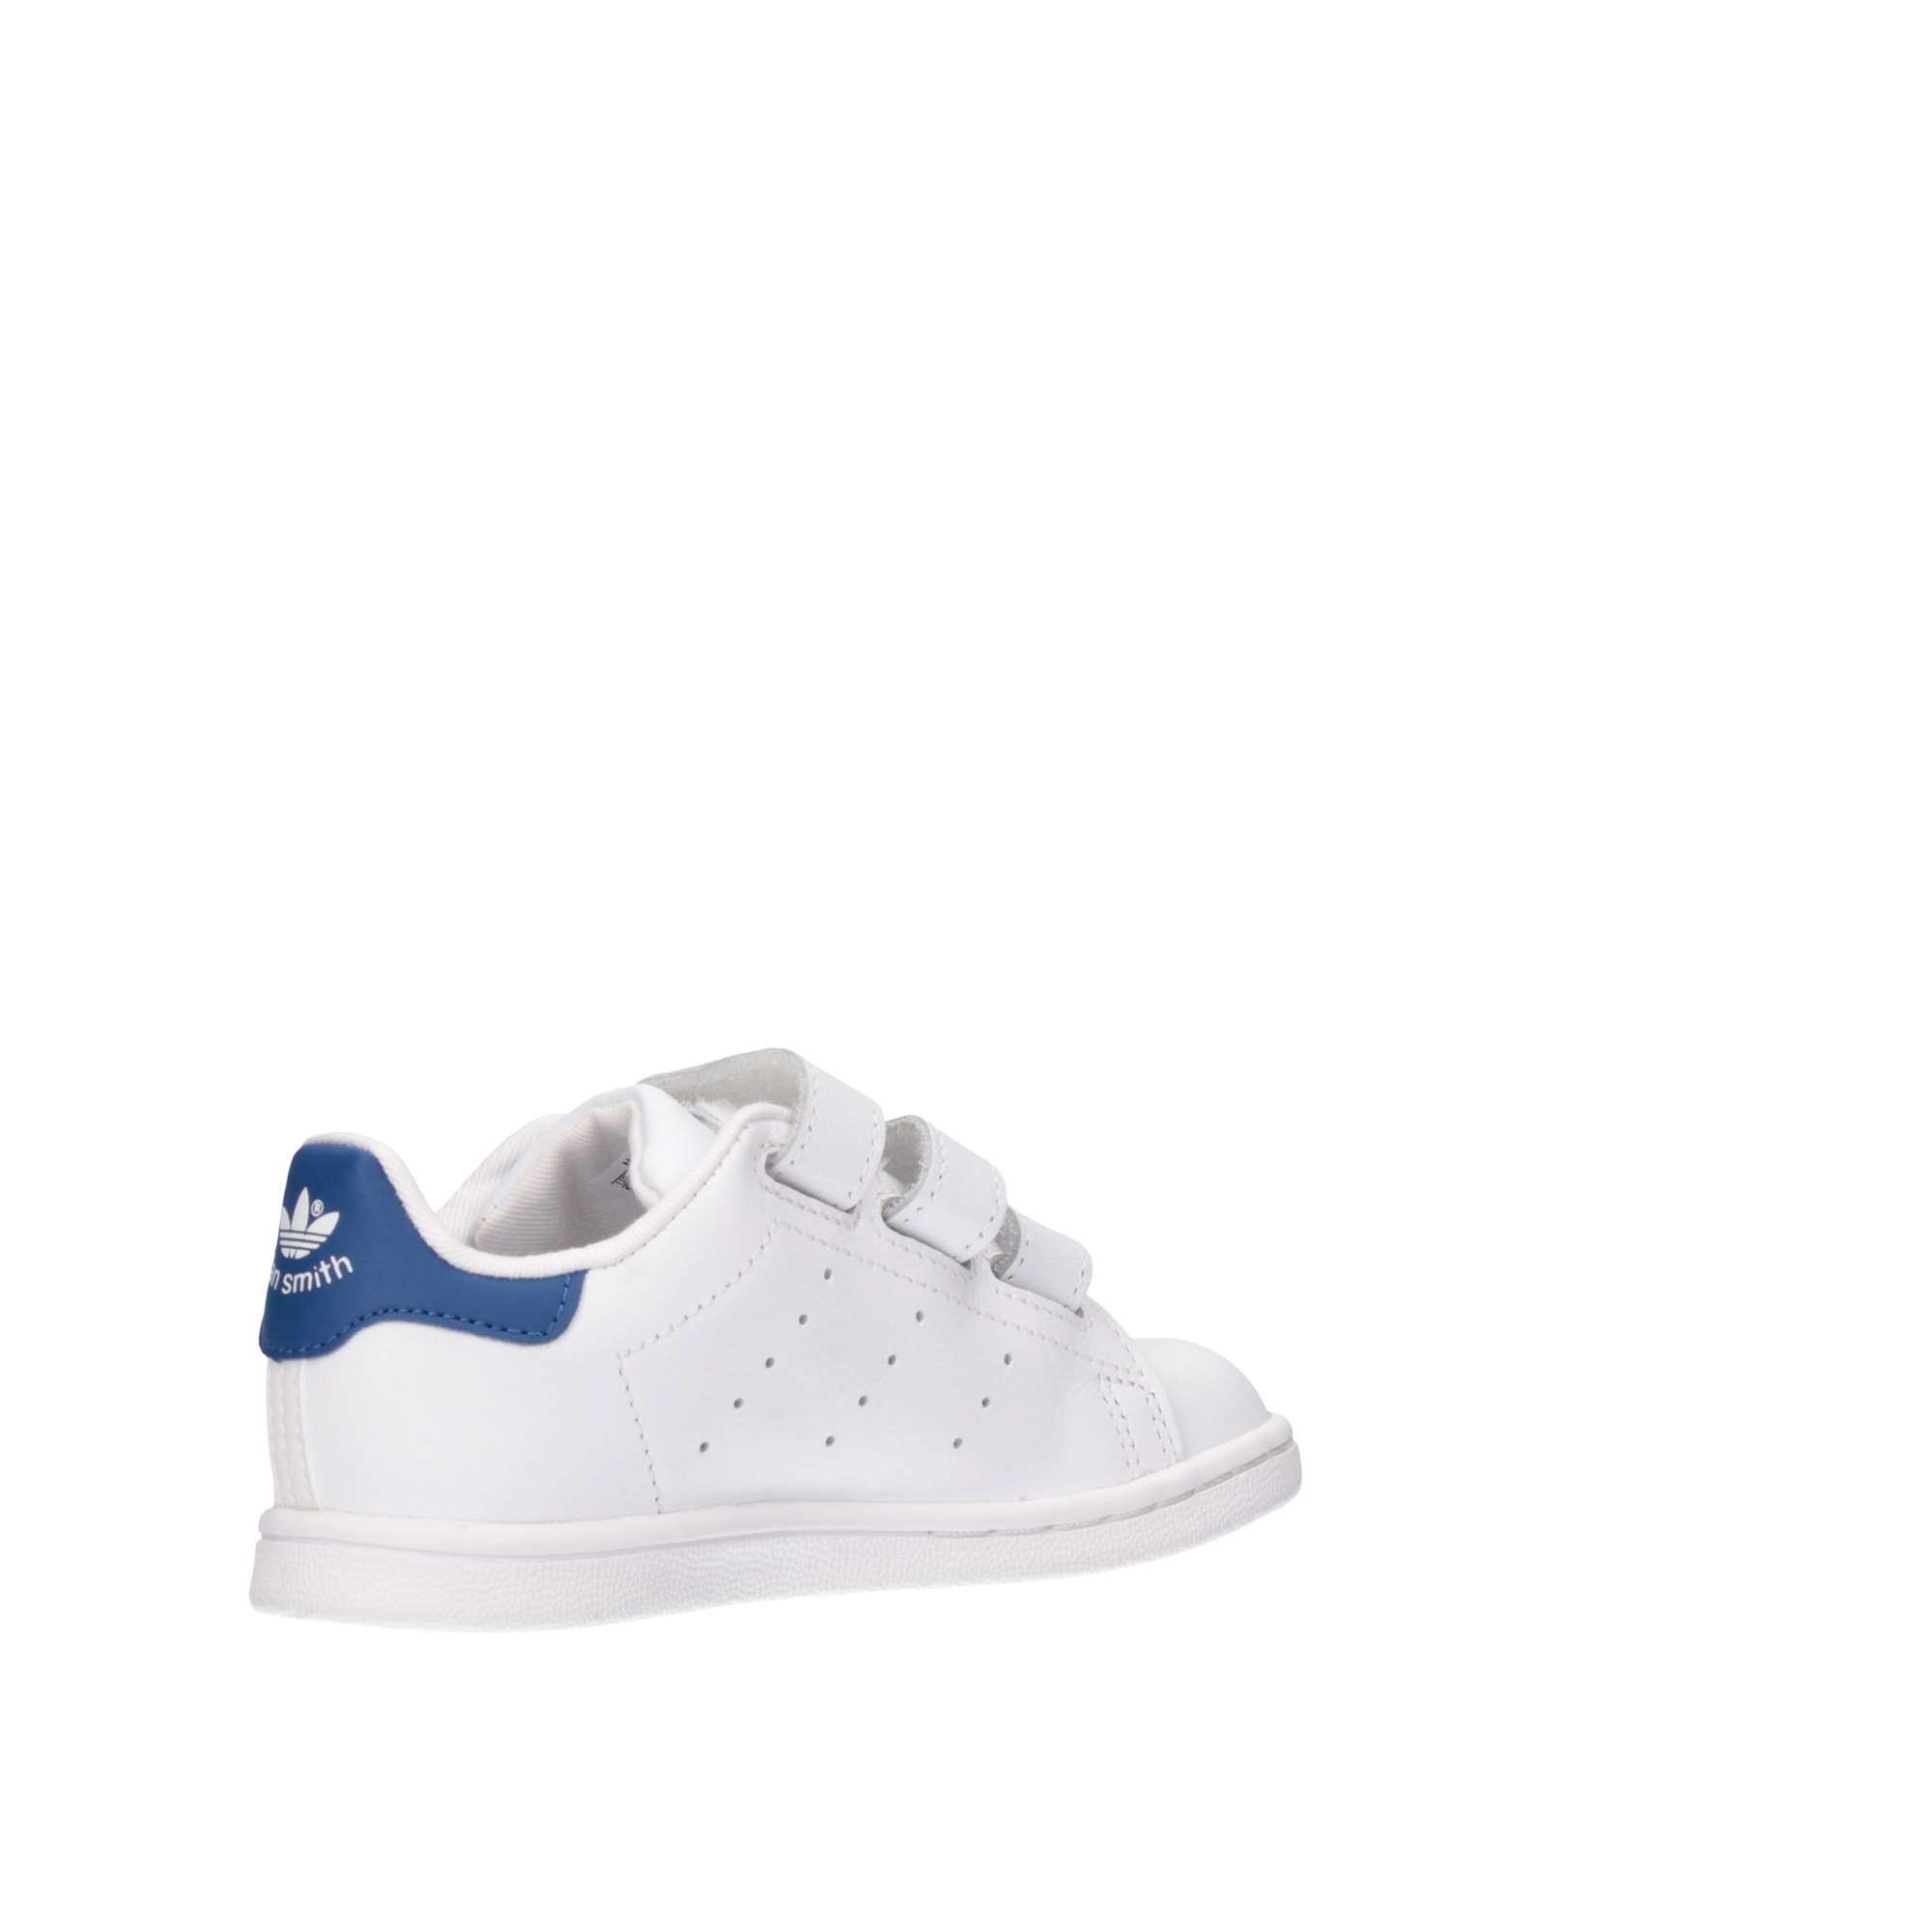 Sneakers-Bambino-Adidas-ADIBZ0522-Autunno-Inverno